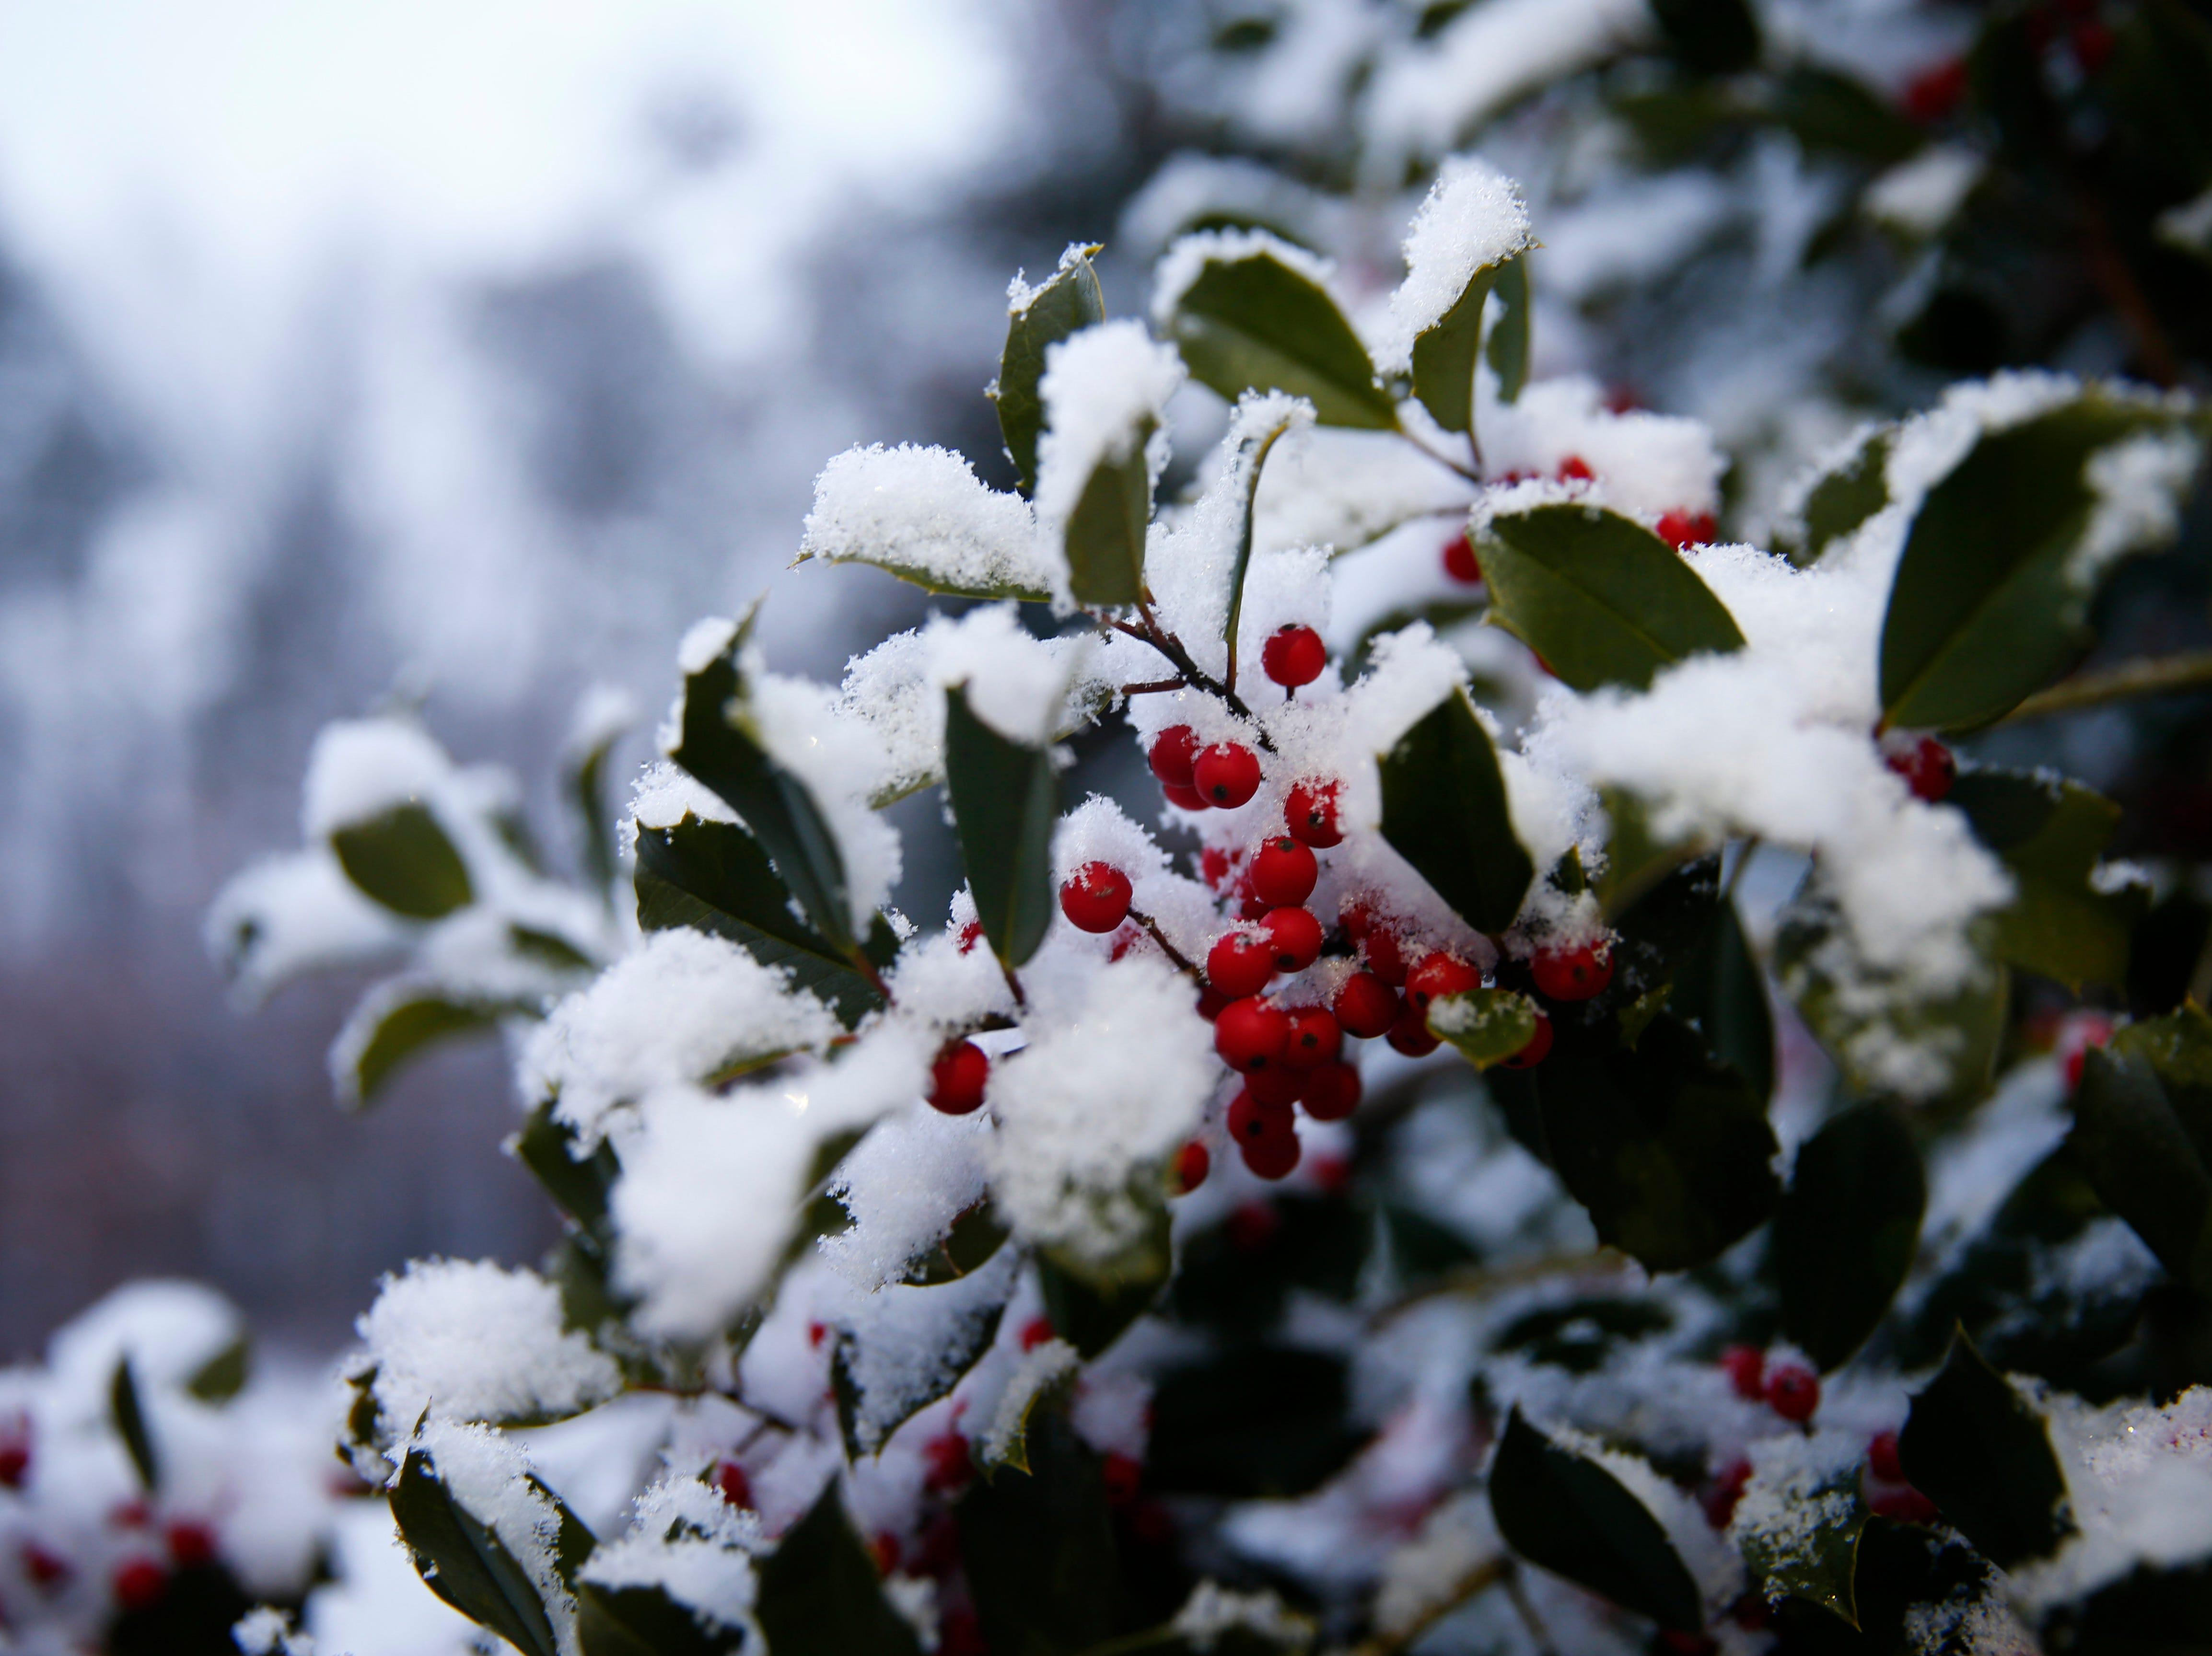 Snow clings to bushes at the James Howard Transportation Center in Brick Township Friday morning, January 18, 2019.